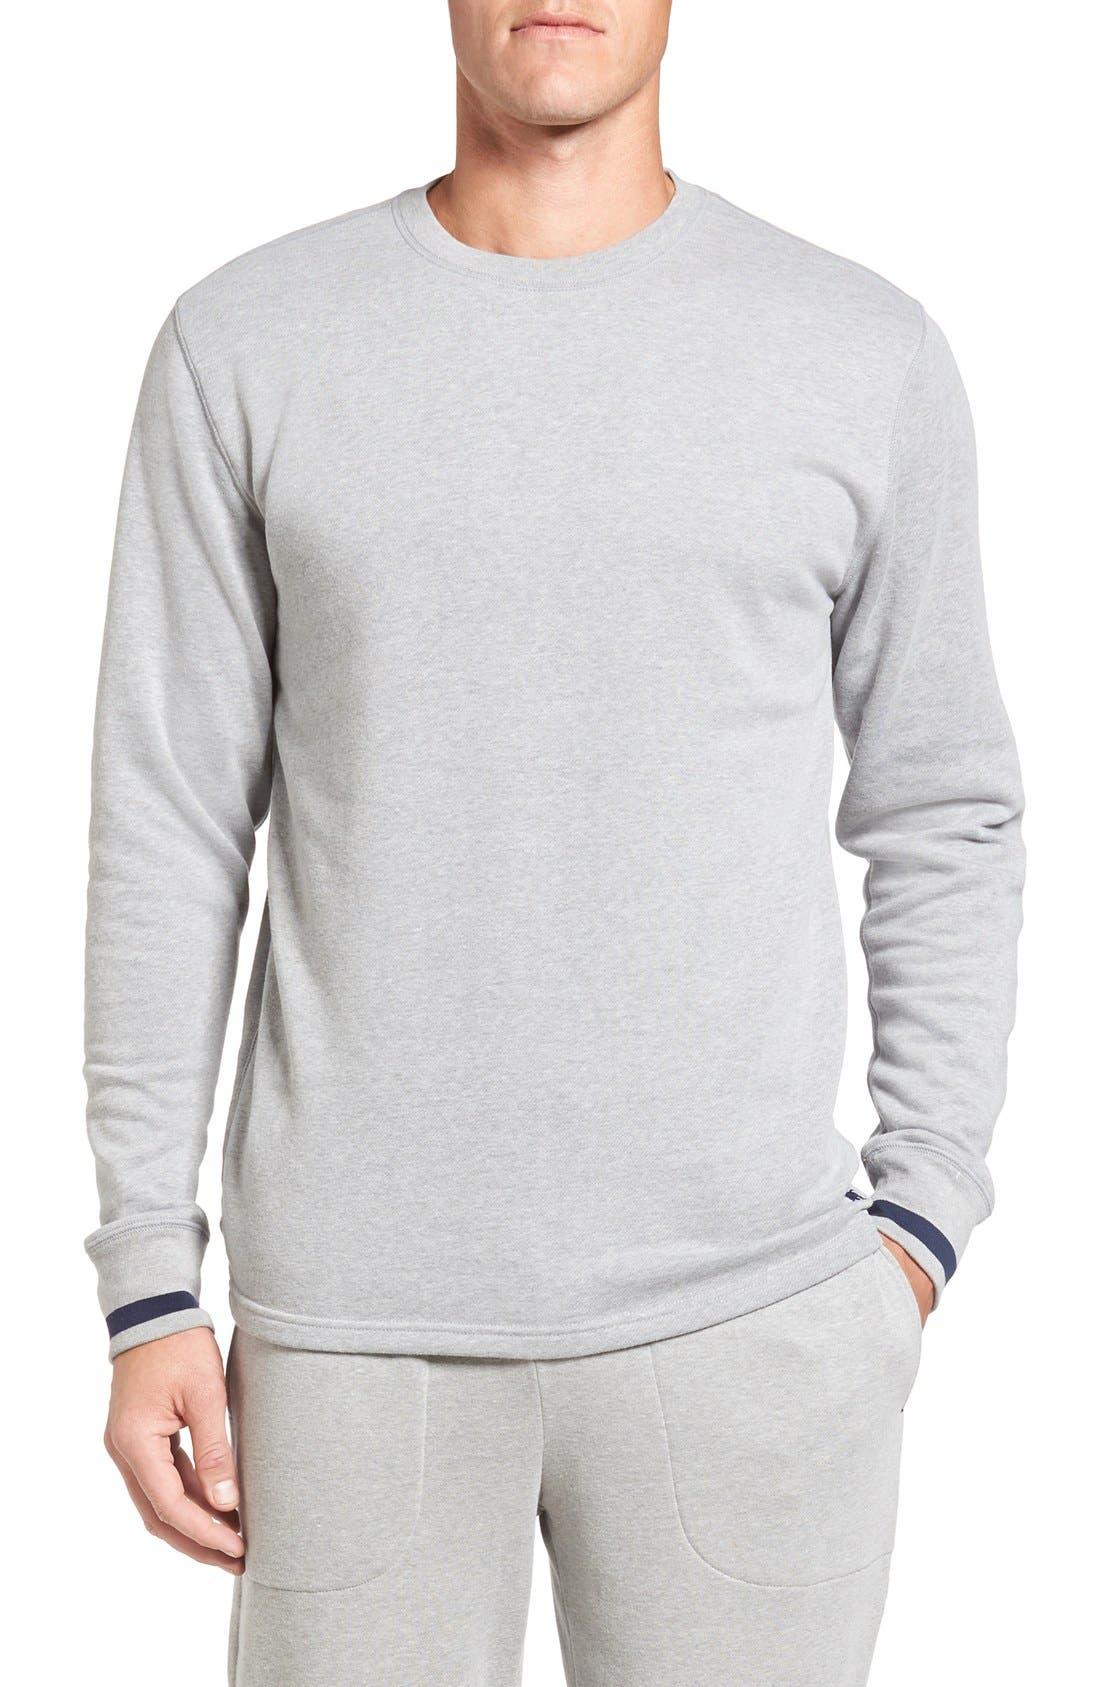 Main Image - Polo Ralph Lauren Brushed Jersey Cotton Blend Crewneck Sweatshirt